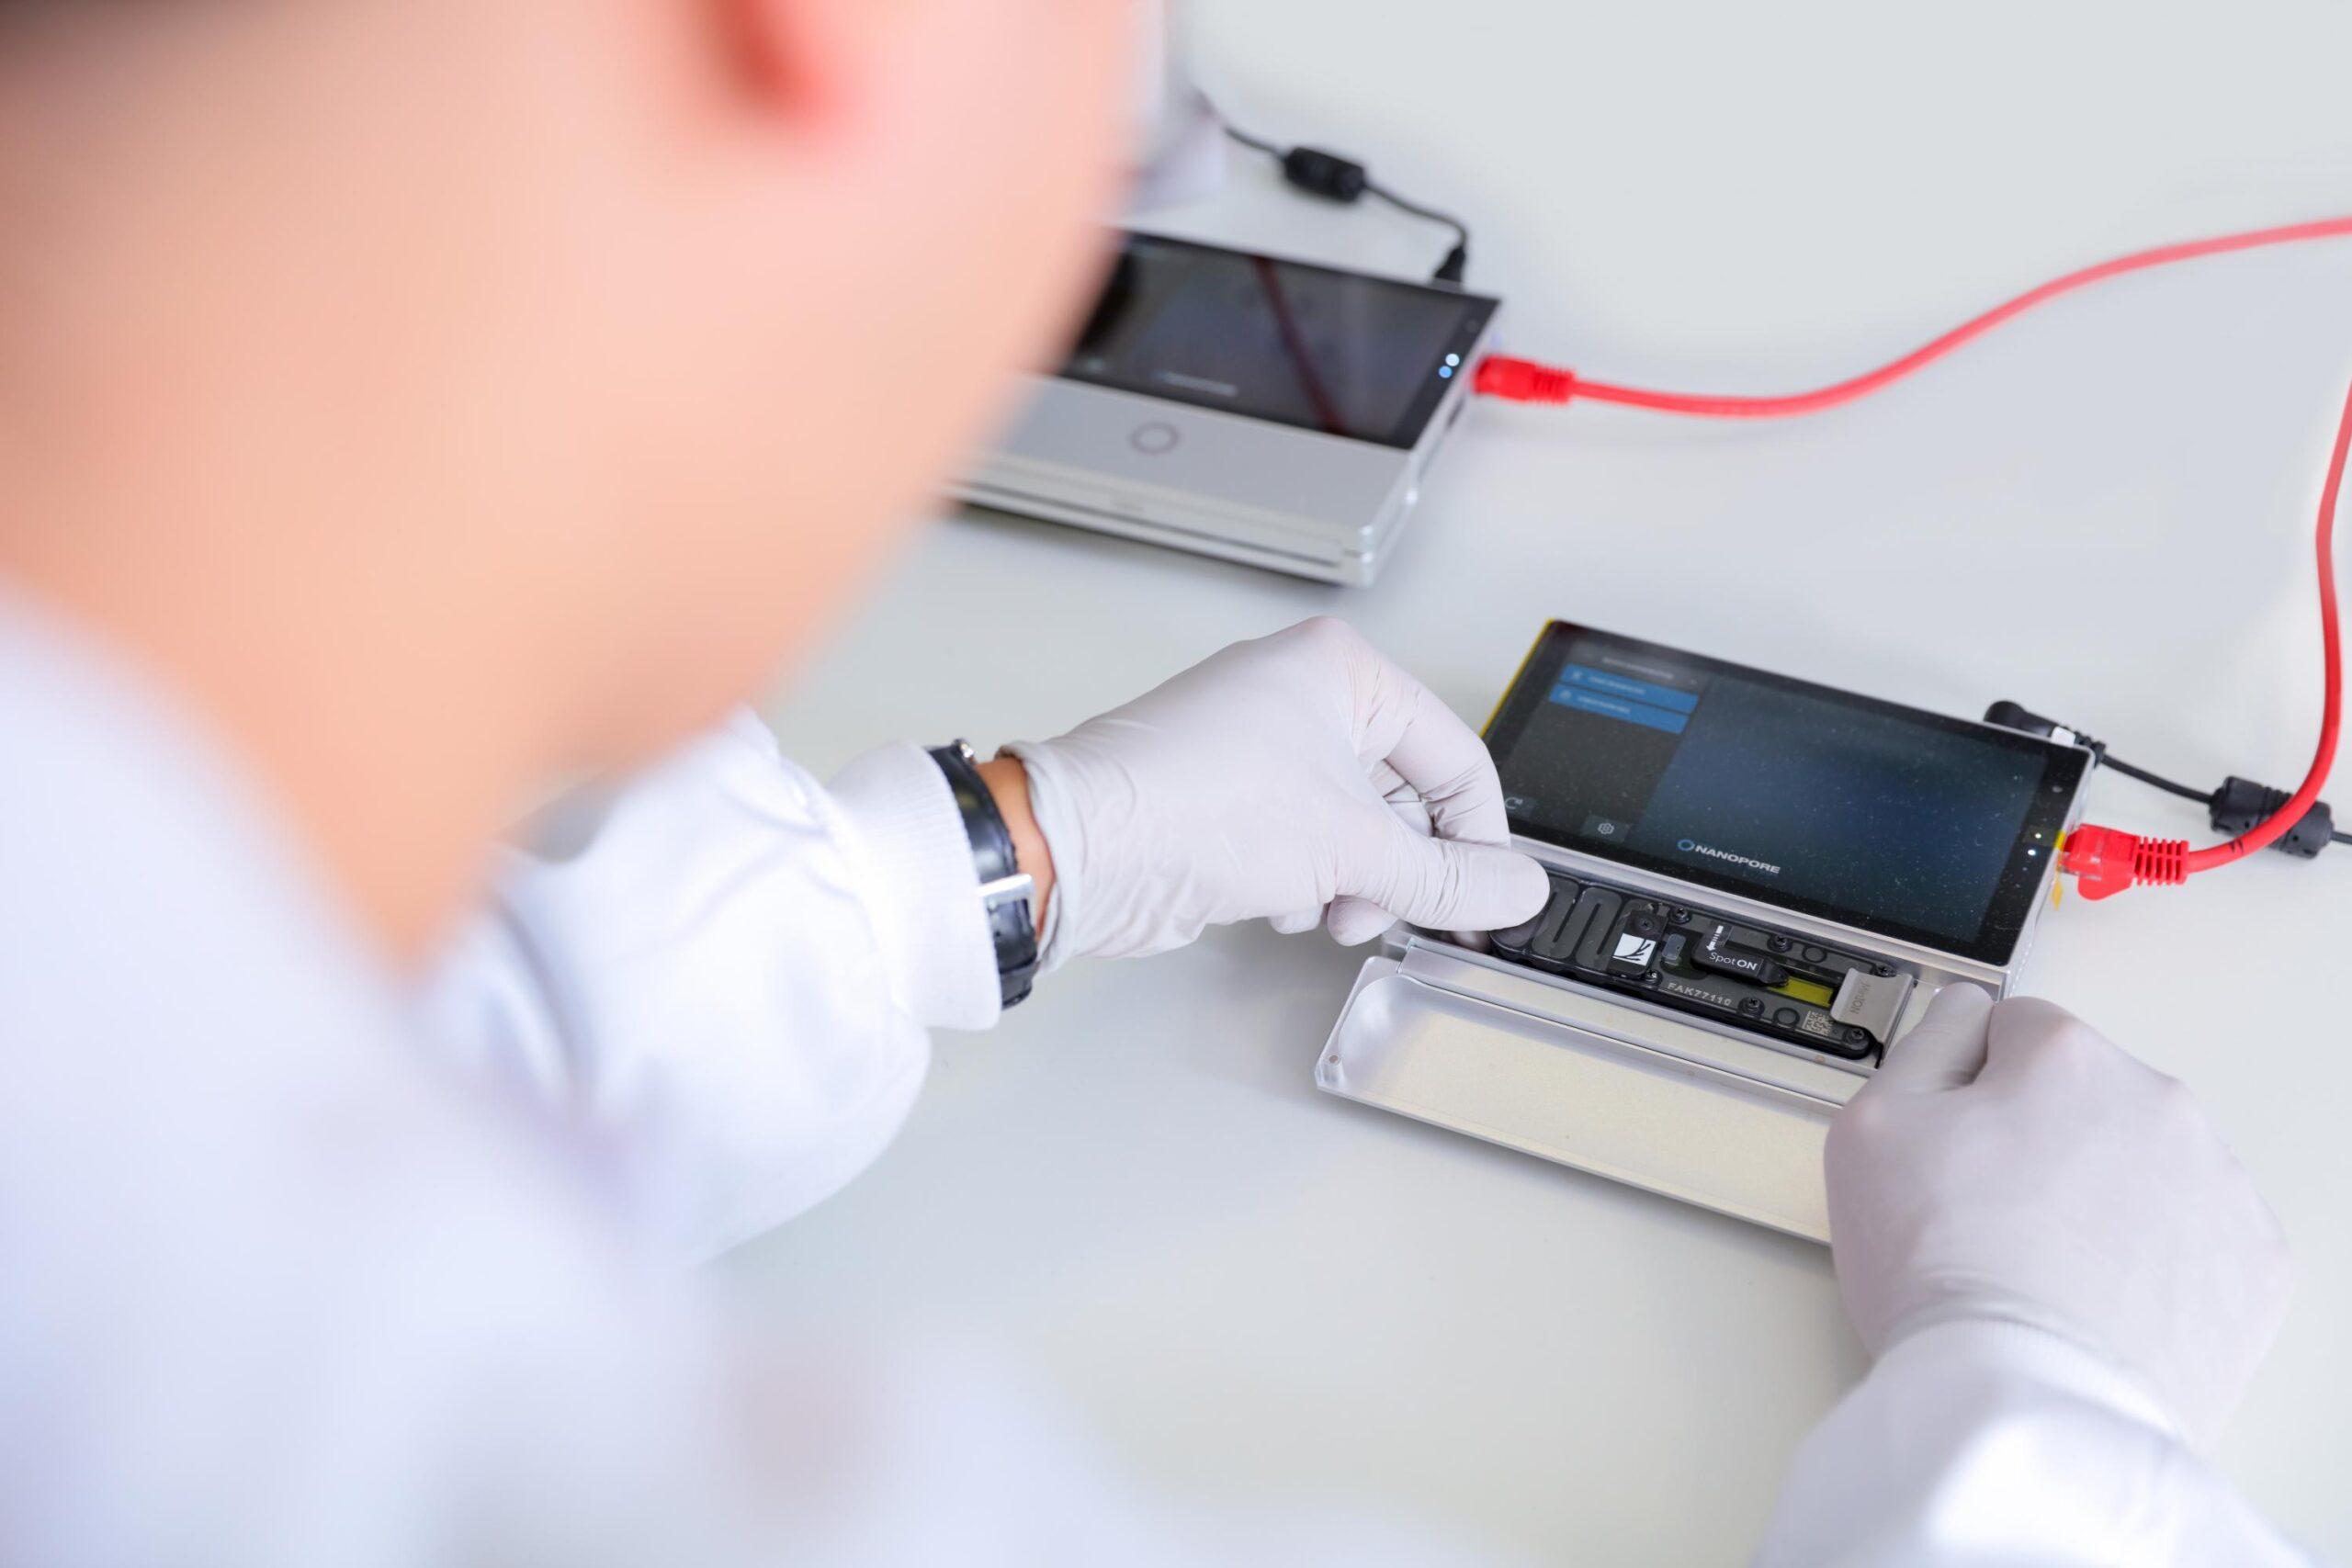 British biotech startup Oxford Nanopore plots £3.6bn London IPO